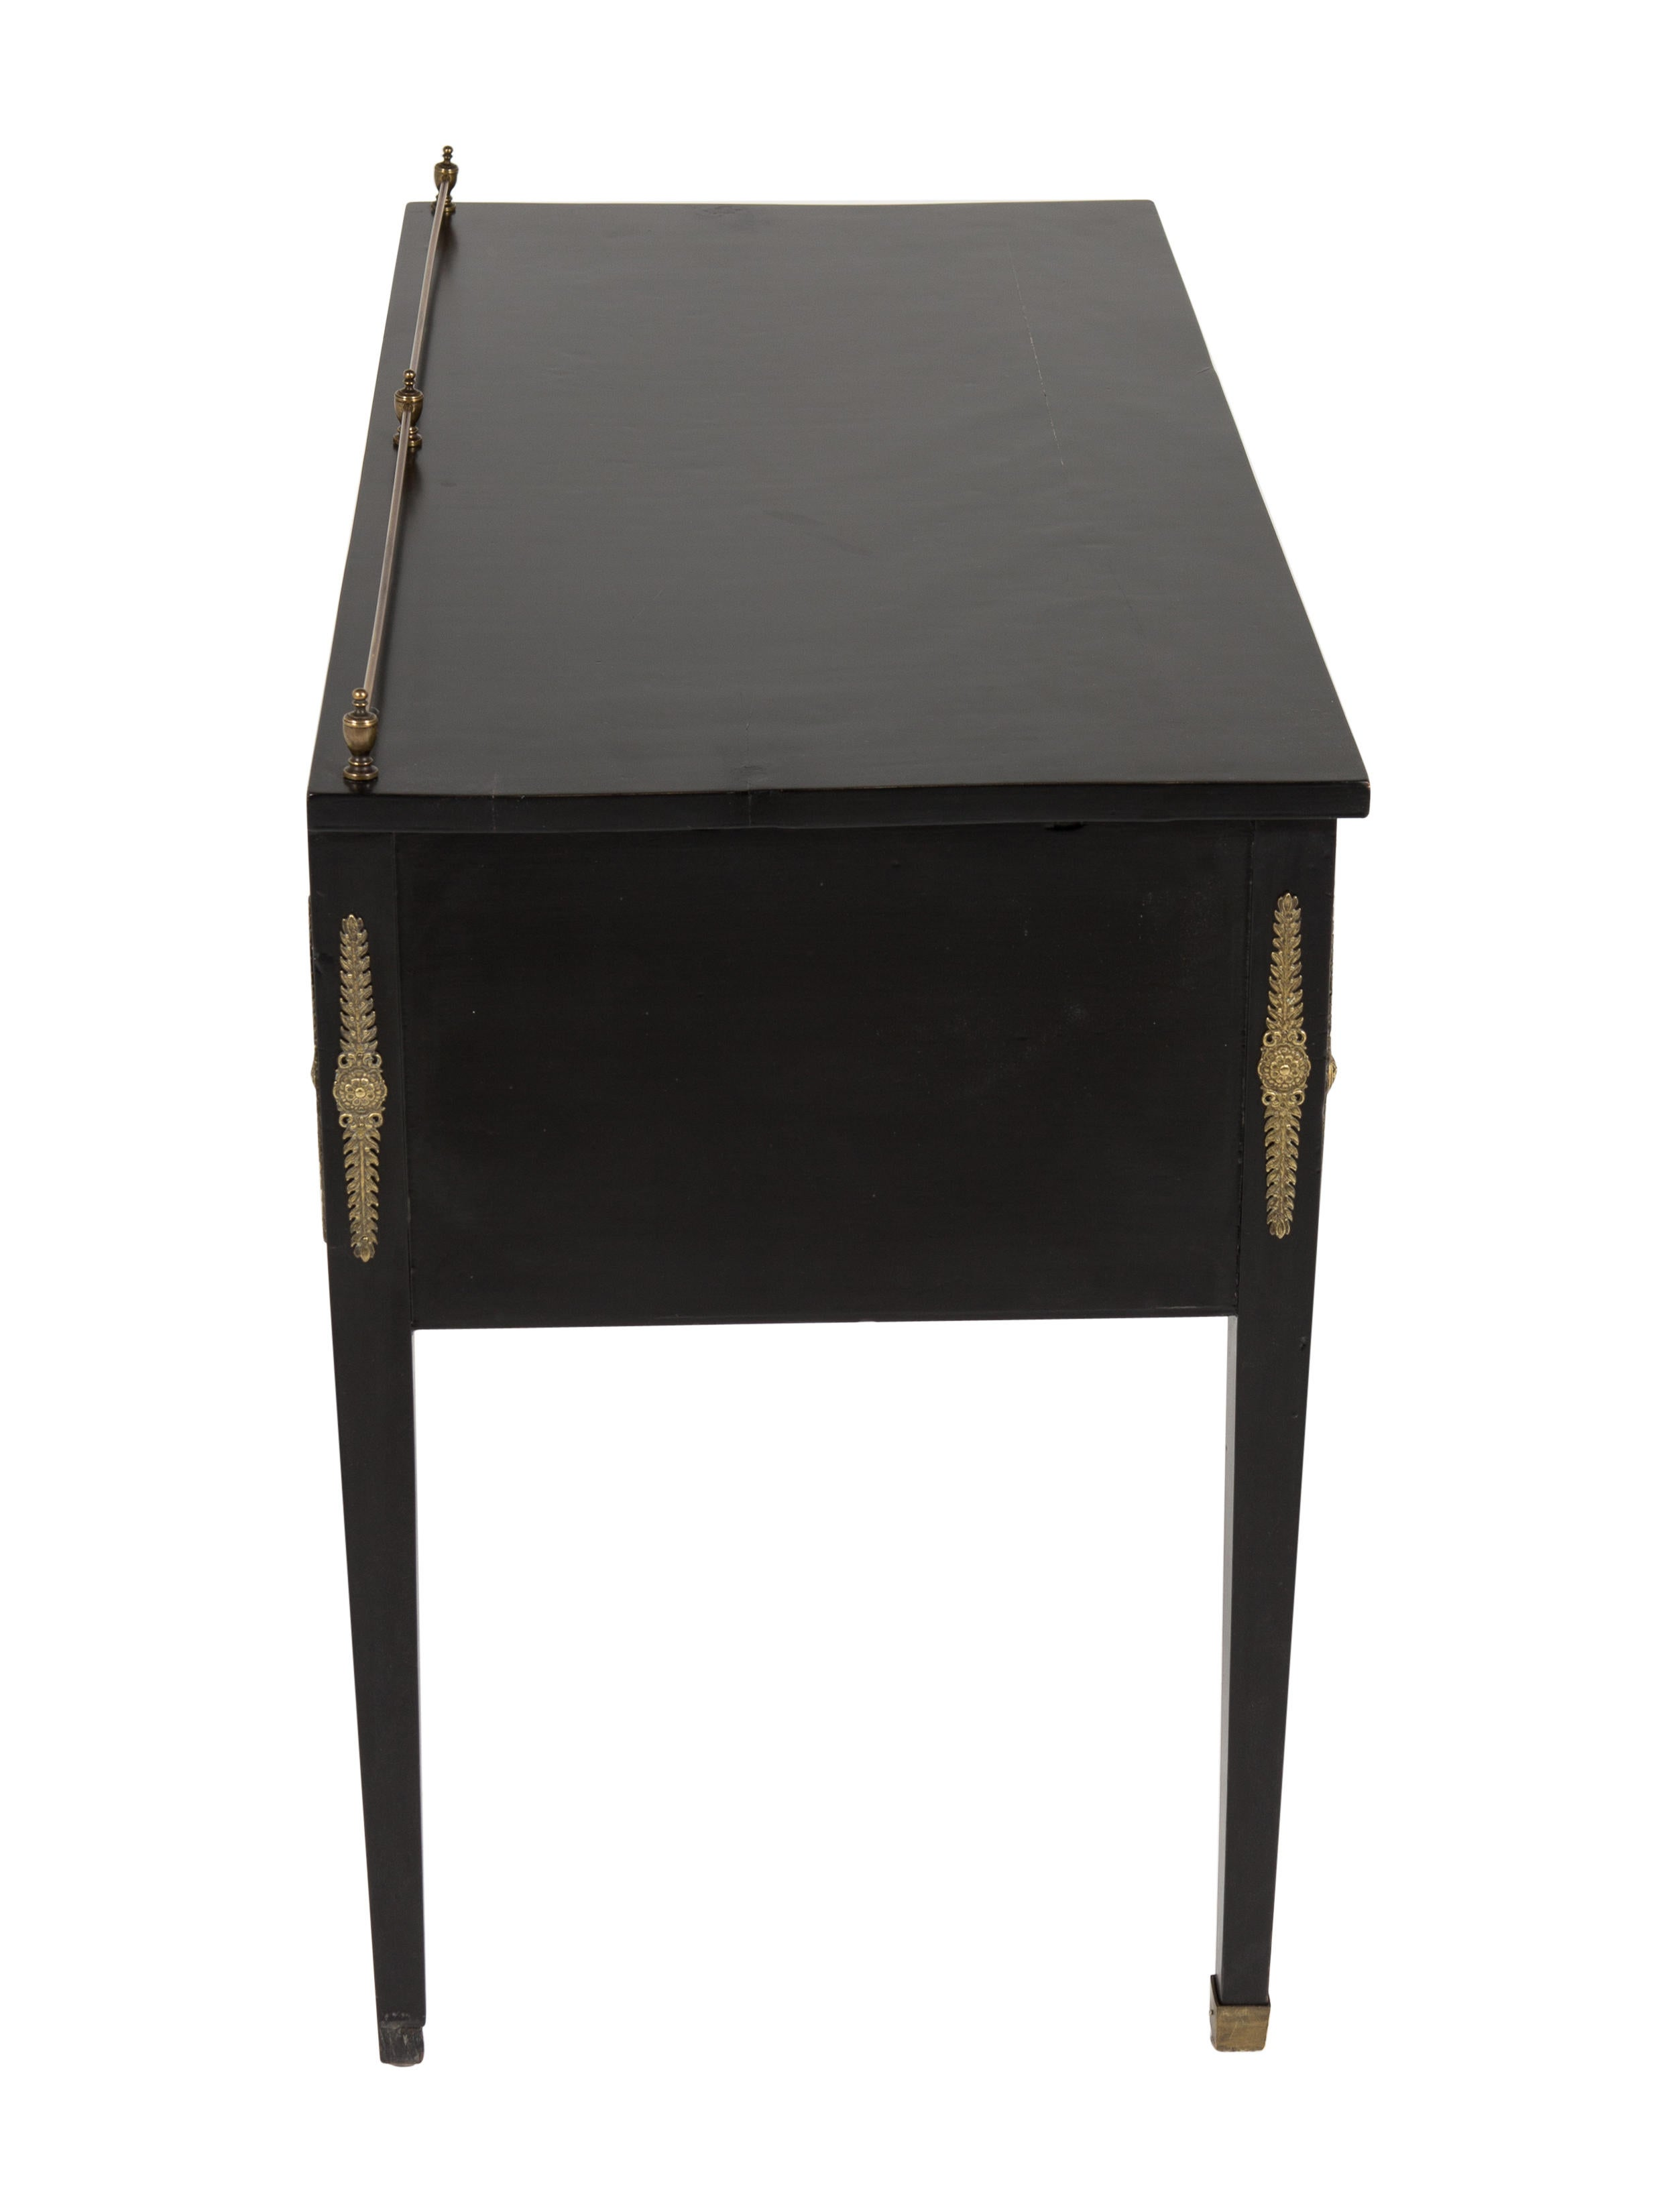 Regency Style Desk Furniture Furni20349 The Realreal